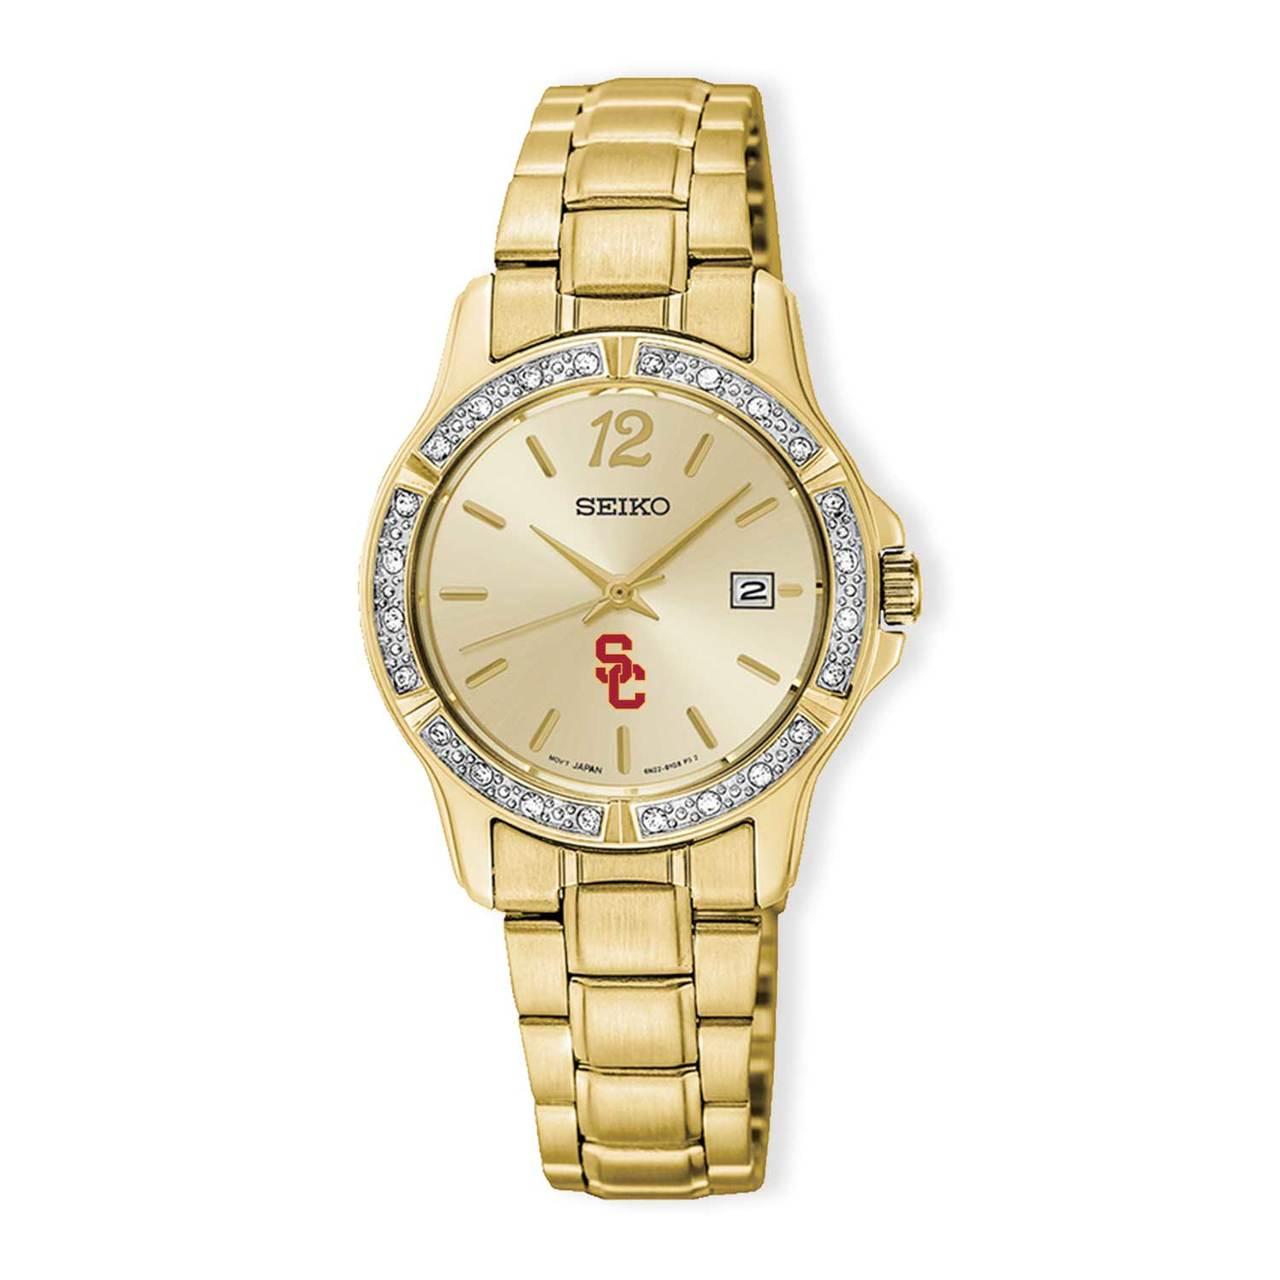 USC Trojans Seiko Ladies` PRIME Gold-tone Crystal Watch